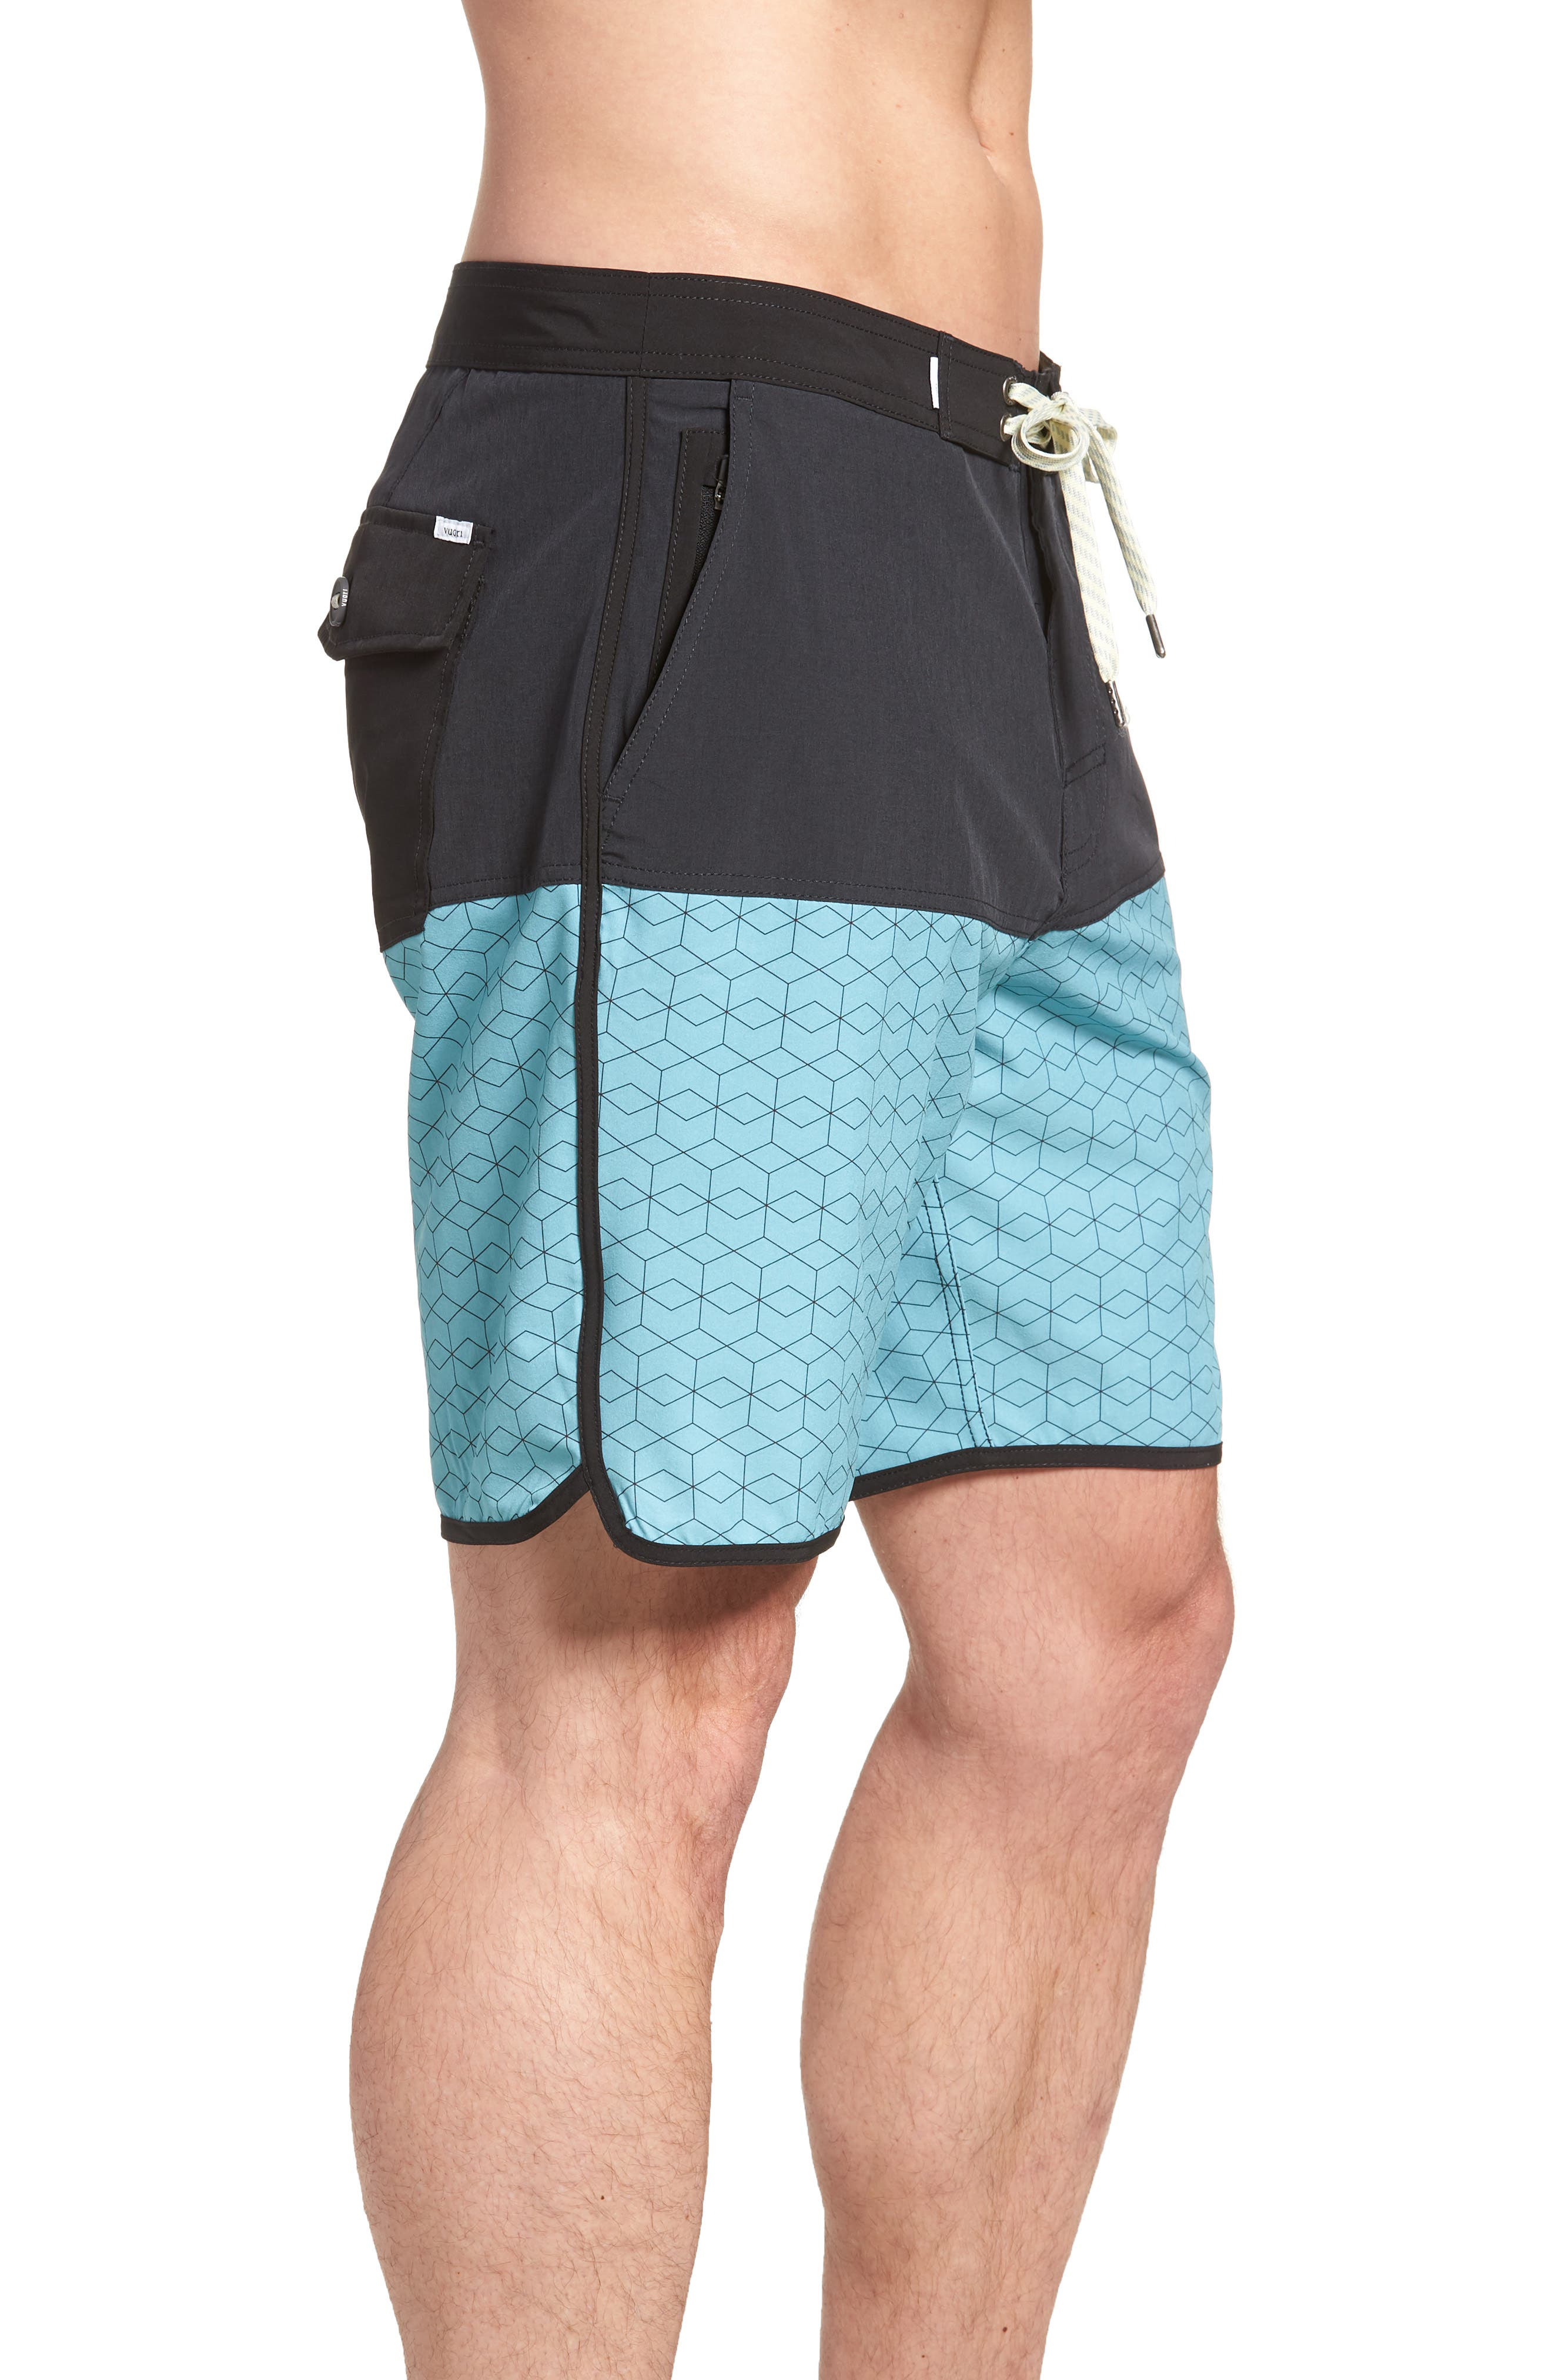 Cruise Hybrid Board Shorts,                             Alternate thumbnail 3, color,                             Glacier Hex Block